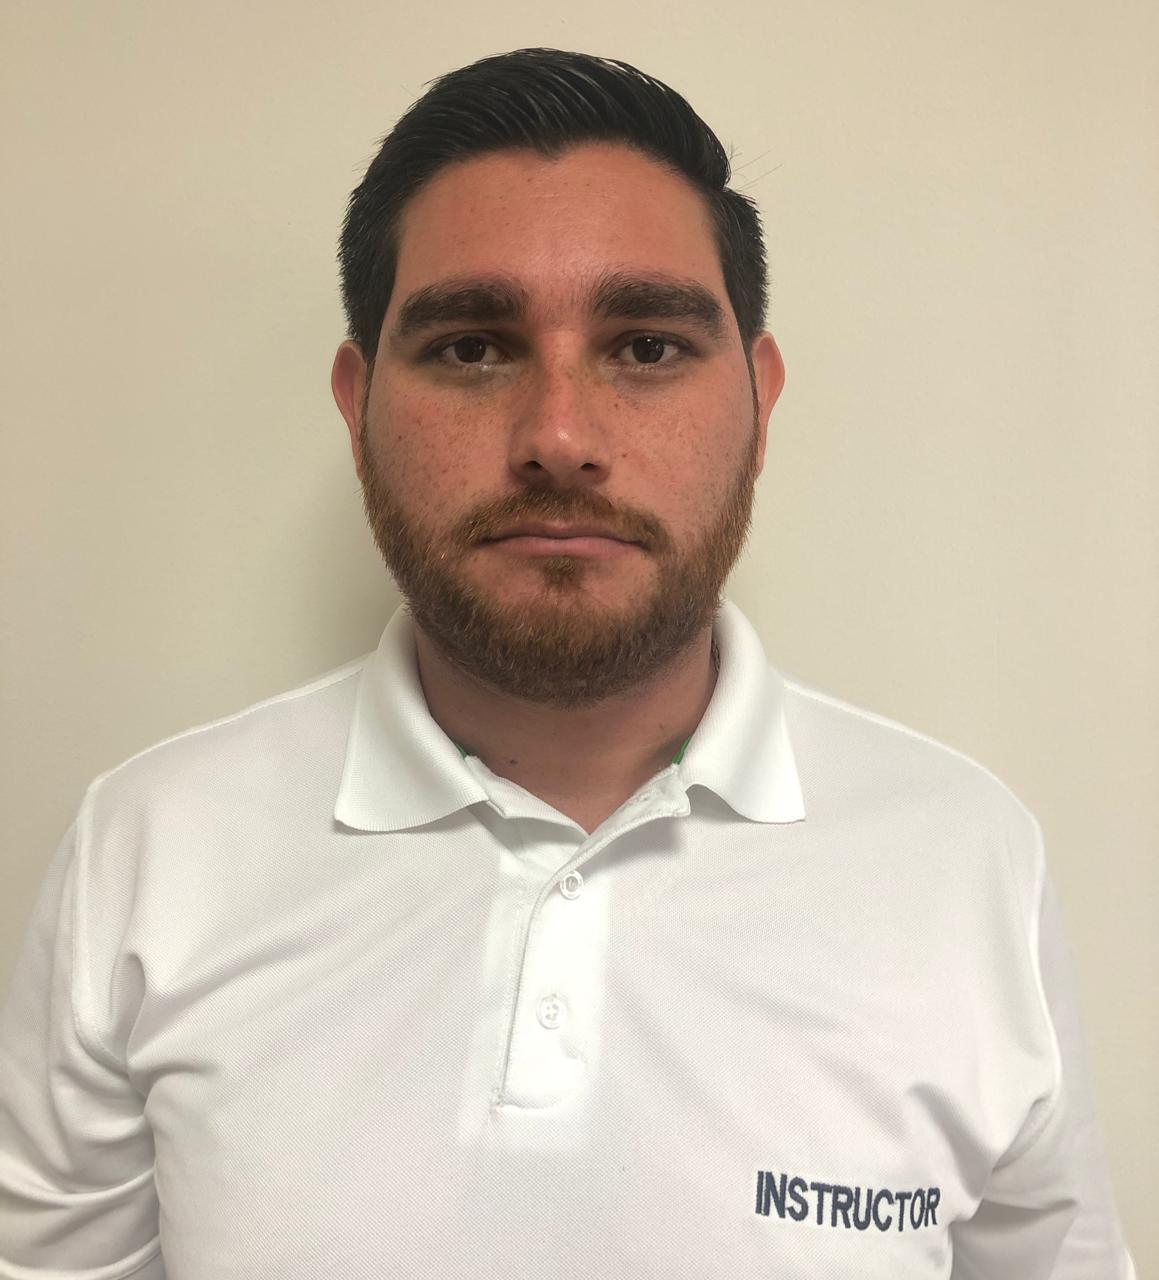 Héctor Ricardo Acosta Valenzuela